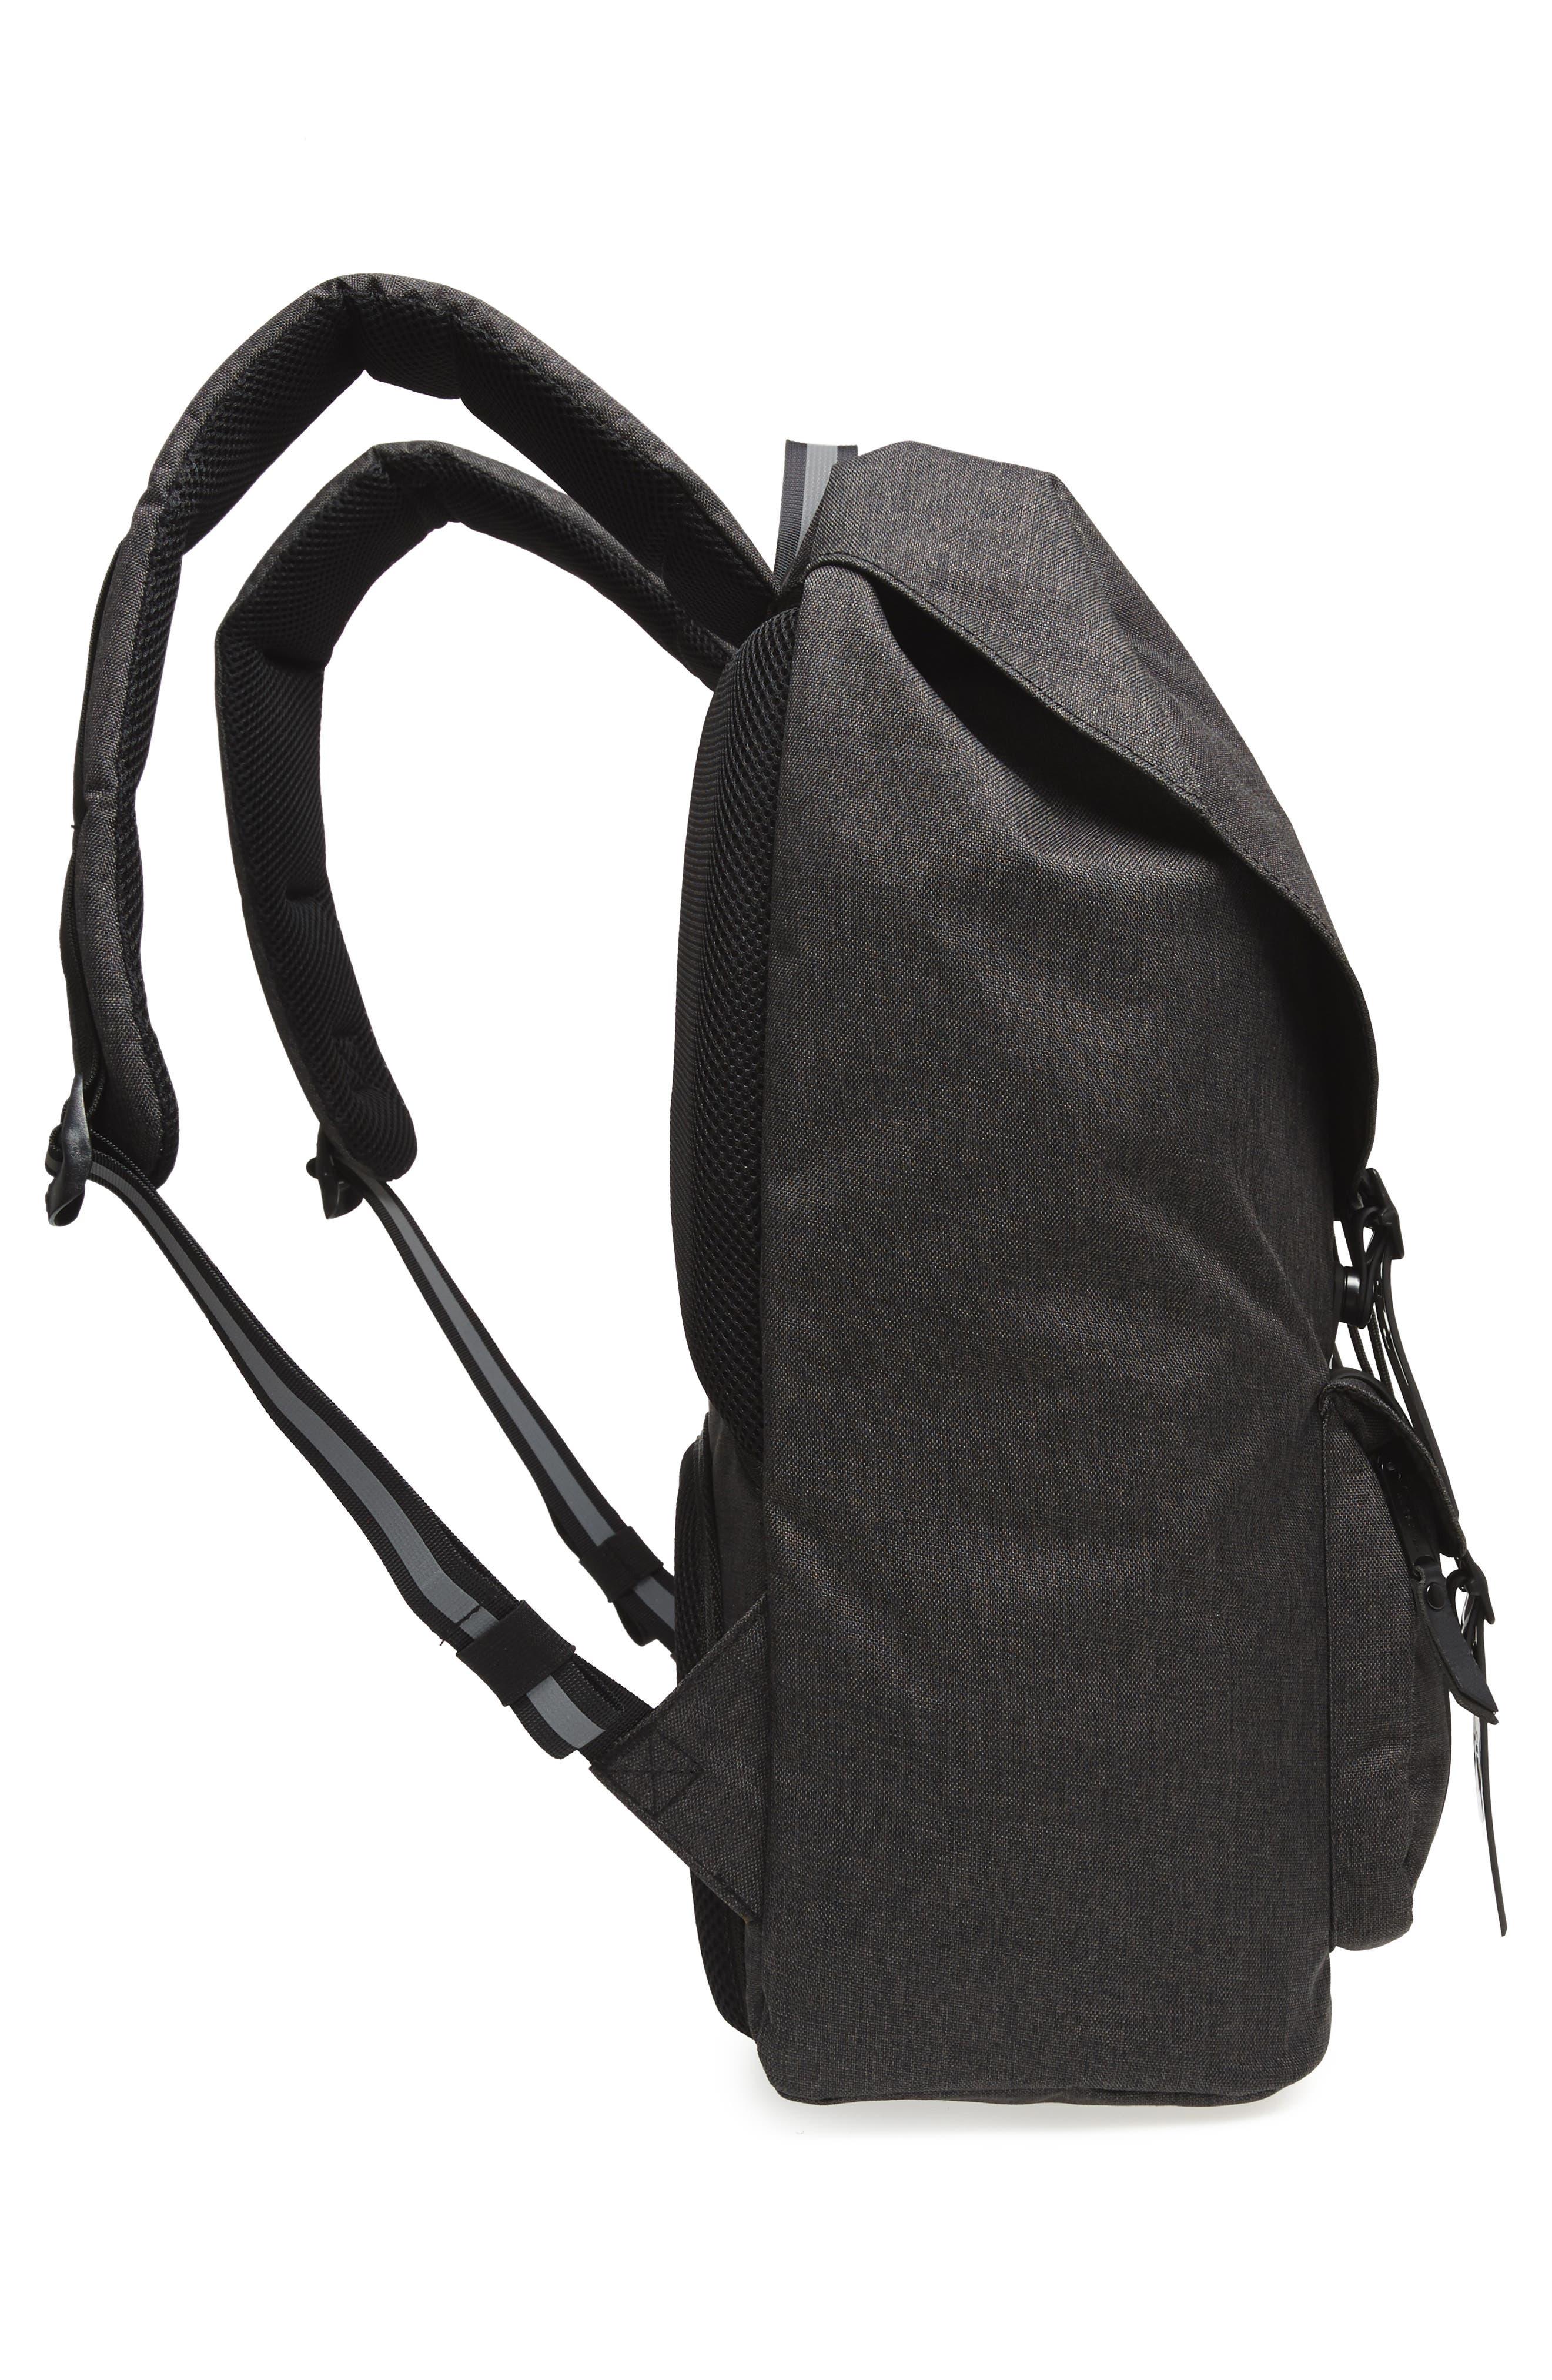 Little America - Reflective Backpack,                             Alternate thumbnail 5, color,                             Black Crosshatch/ Reflective